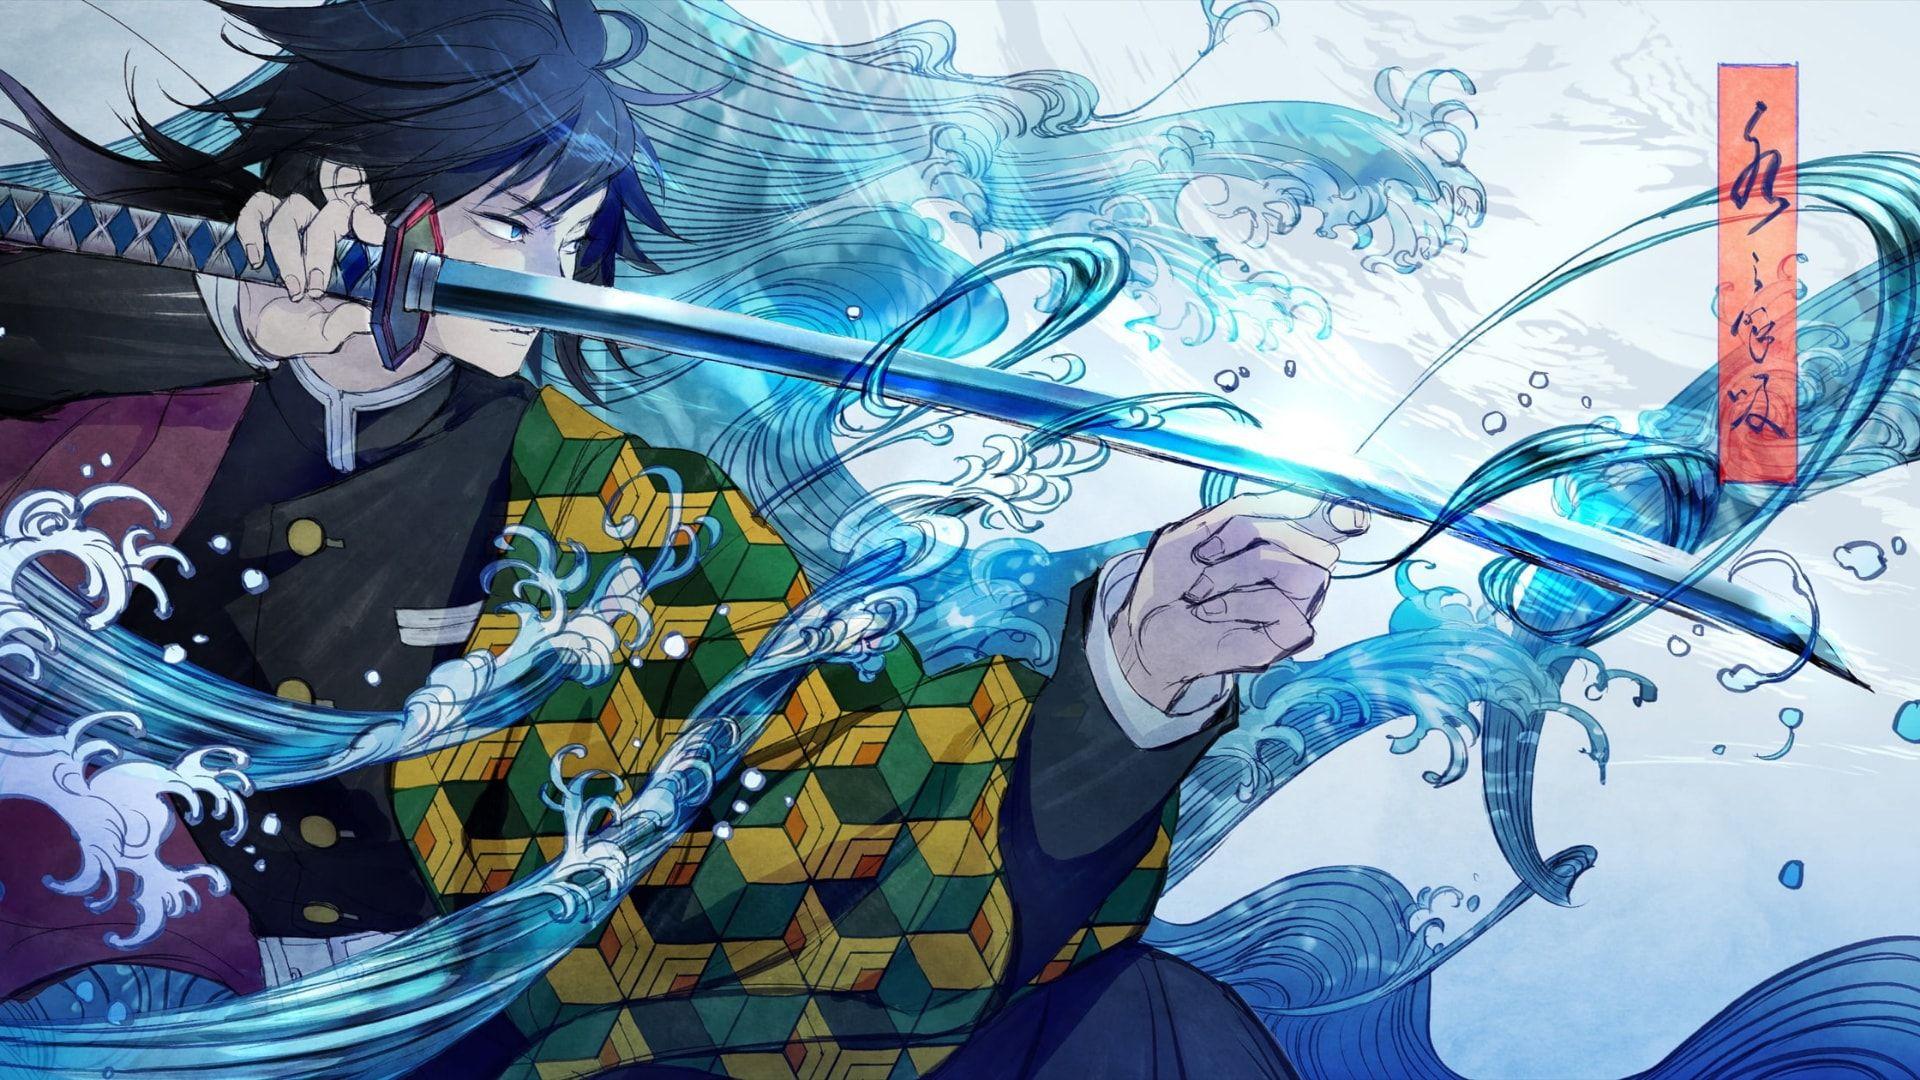 Demon Slayer Wallpaper Wallpaper Nice In 2020 Hd Anime Wallpapers Anime Wallpaper Anime